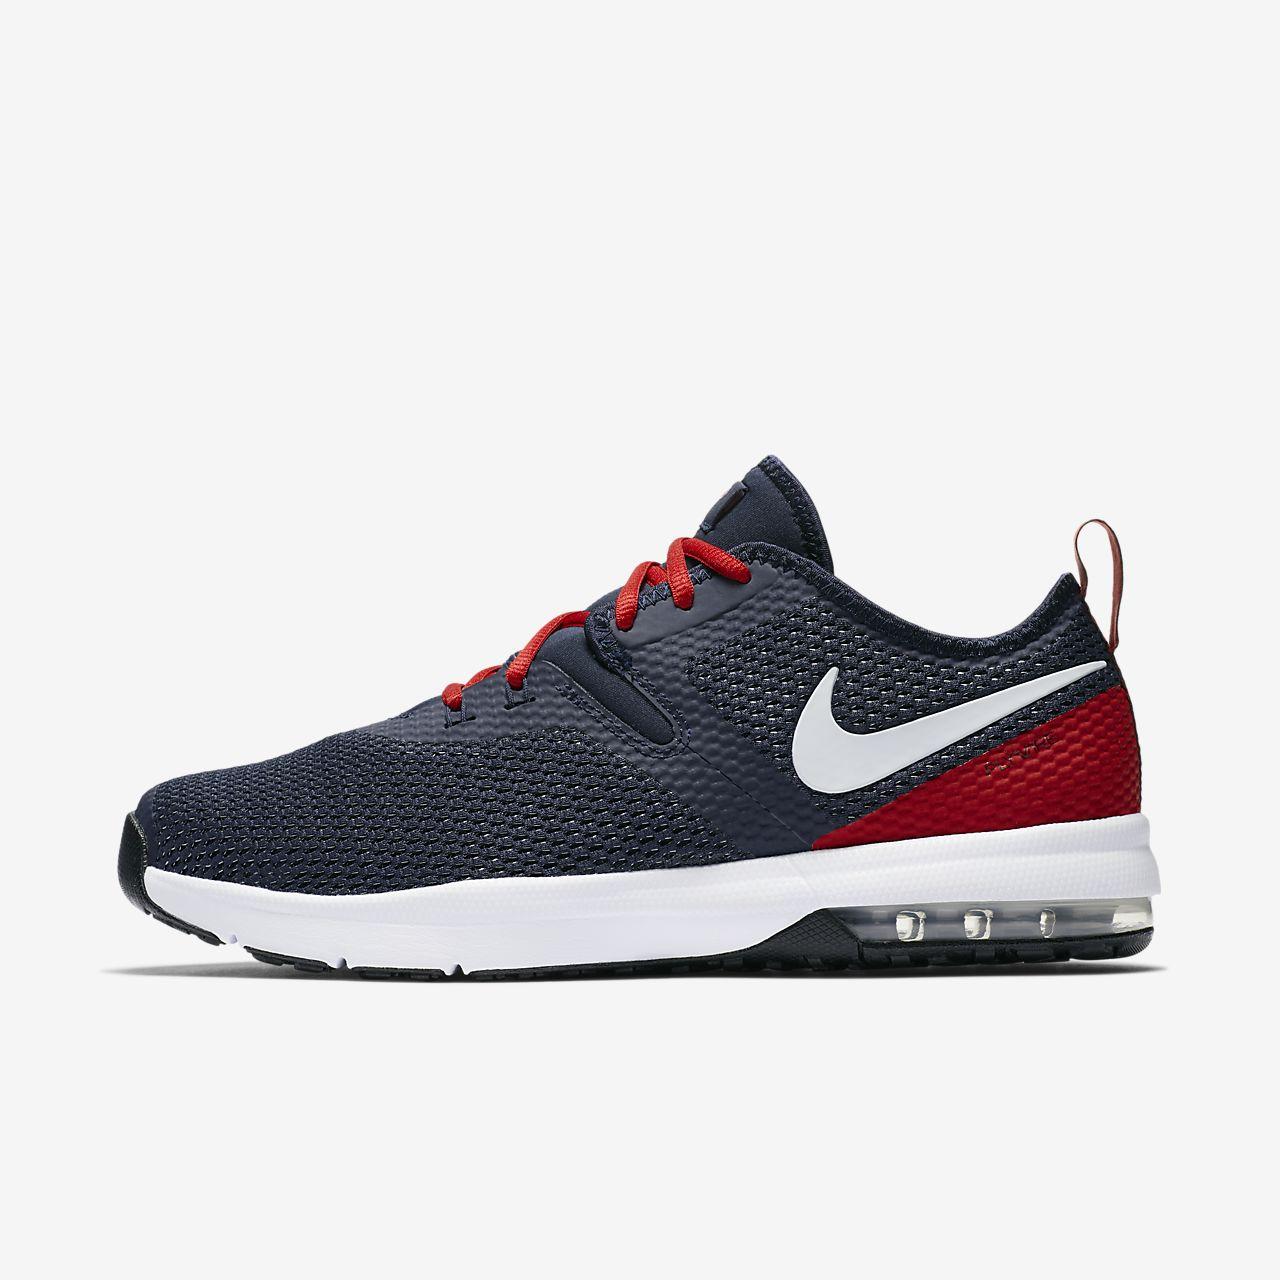 new styles 156b5 cf723 ... wholesale nike air max typha 2 nfl houston mens gym gameday shoe dcba6  1b7bf